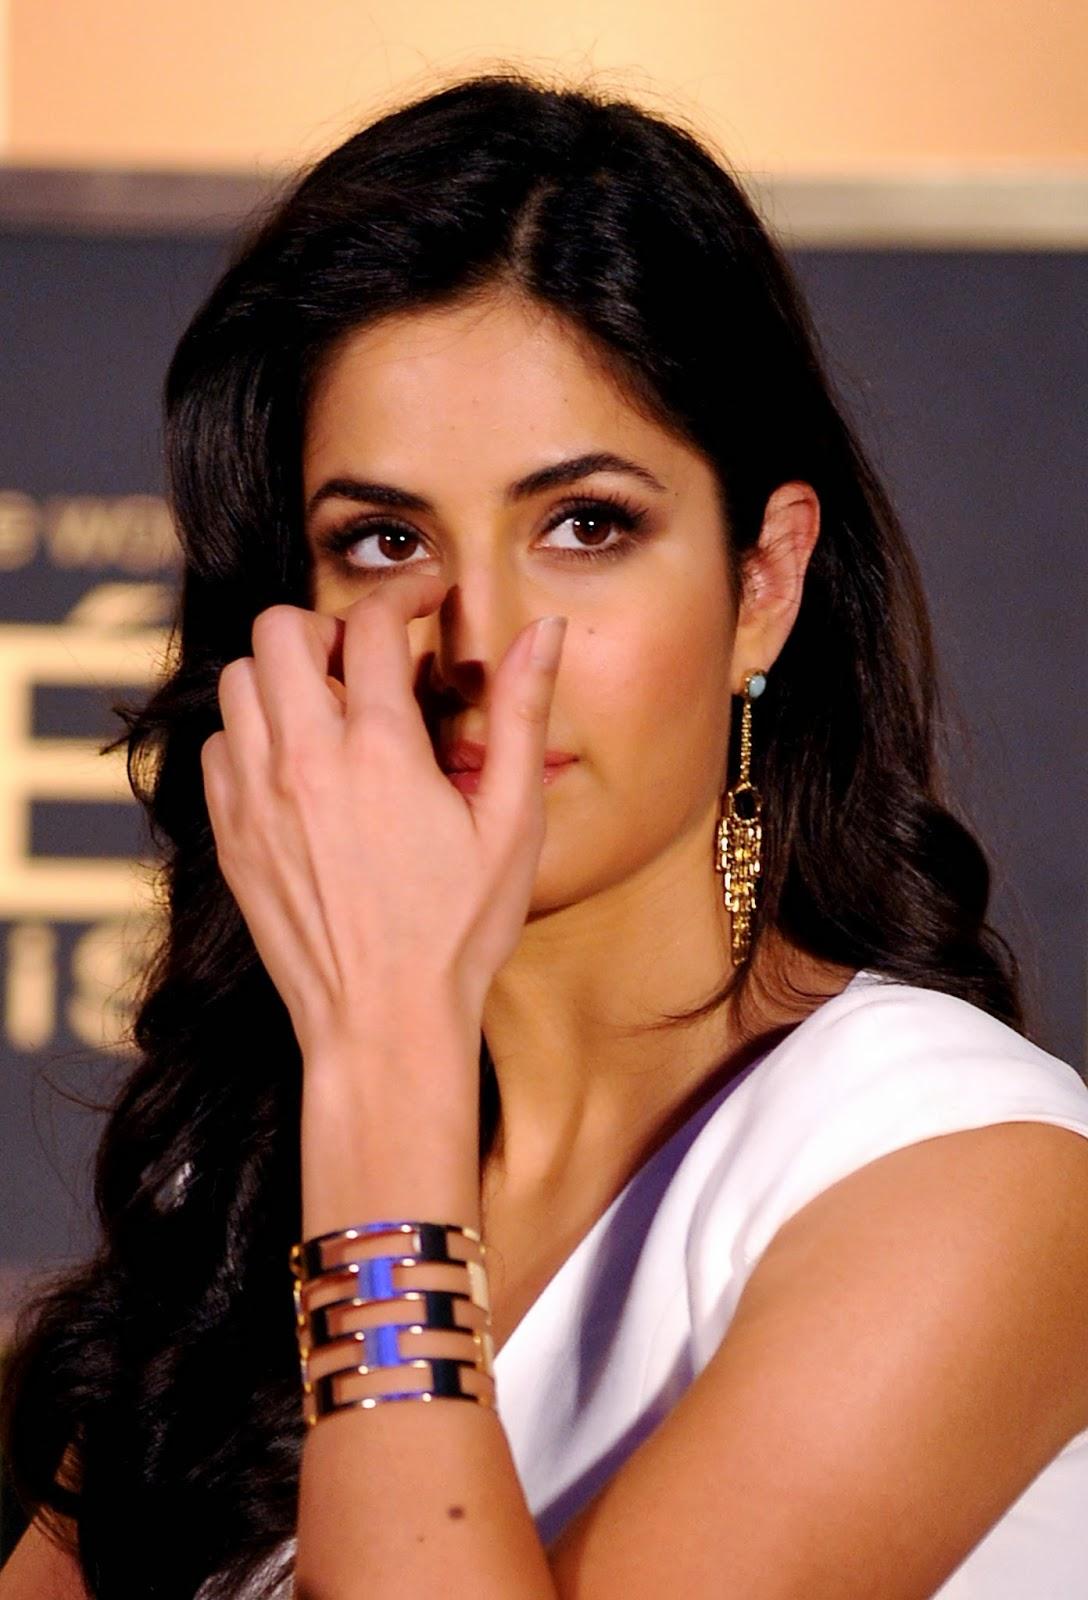 Actress, Aishwarya Rai, Ambassador, Bachchan, Bollywood, Brand, Cosmetic, Freida Pinto, India, Katrina Kaif, Katrina Kaif 2014, L'Oreal Paris, Model, Product, Showbiz, Sonam Kapoor, Stars,